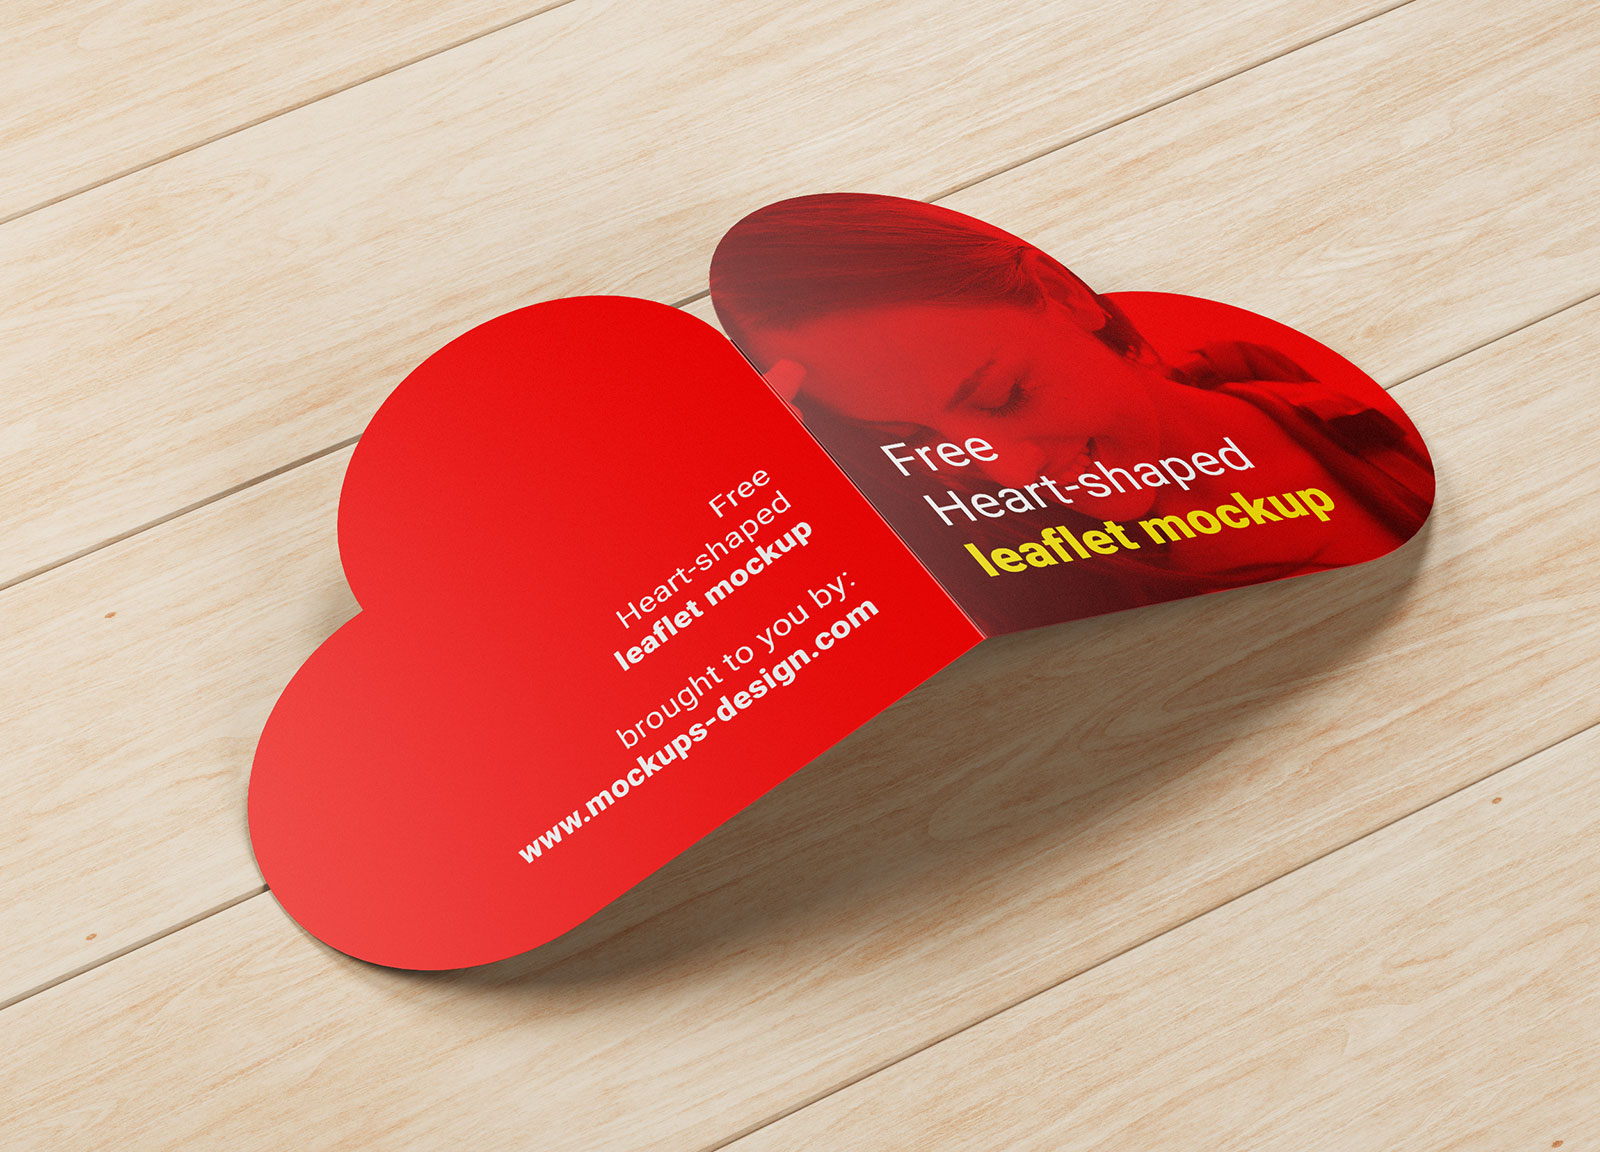 Free-Heart-Shaped-Brochure-Leaflet-Mockup-PSD-2